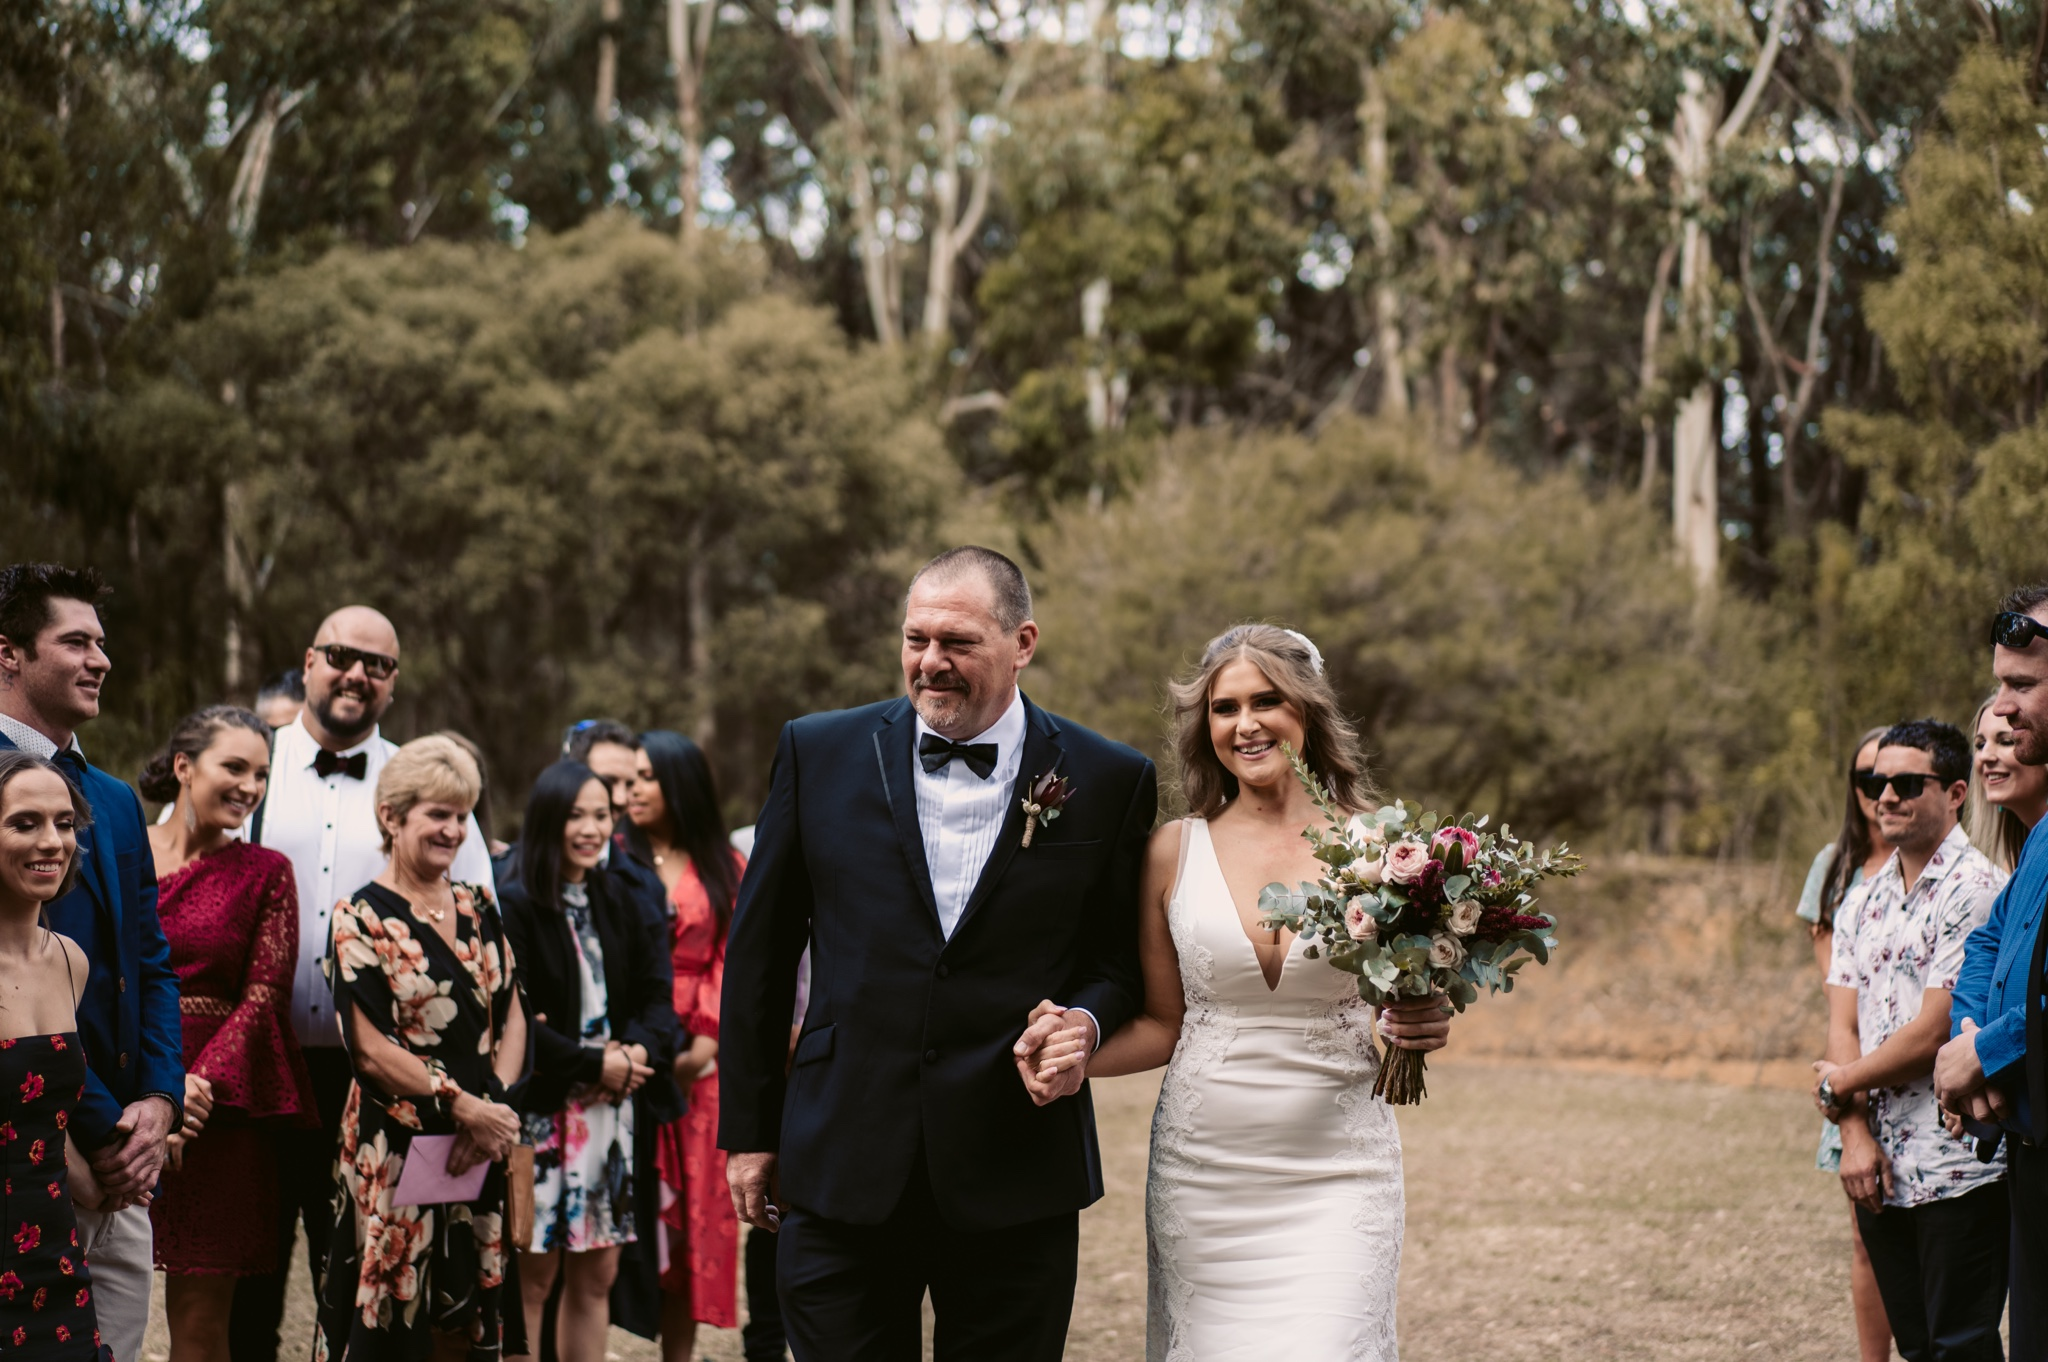 Mornington Peninsula Wedding Photography46.jpg